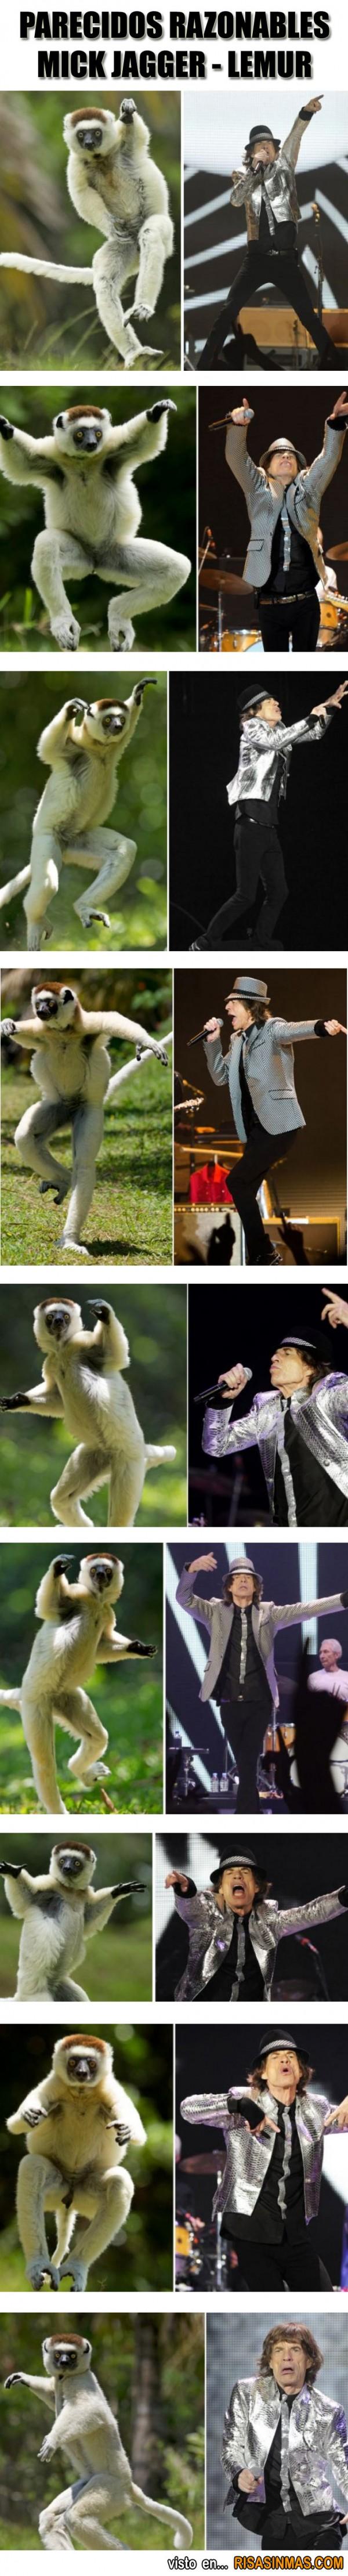 Parecidos razonables: Mick Jagger - Lemur